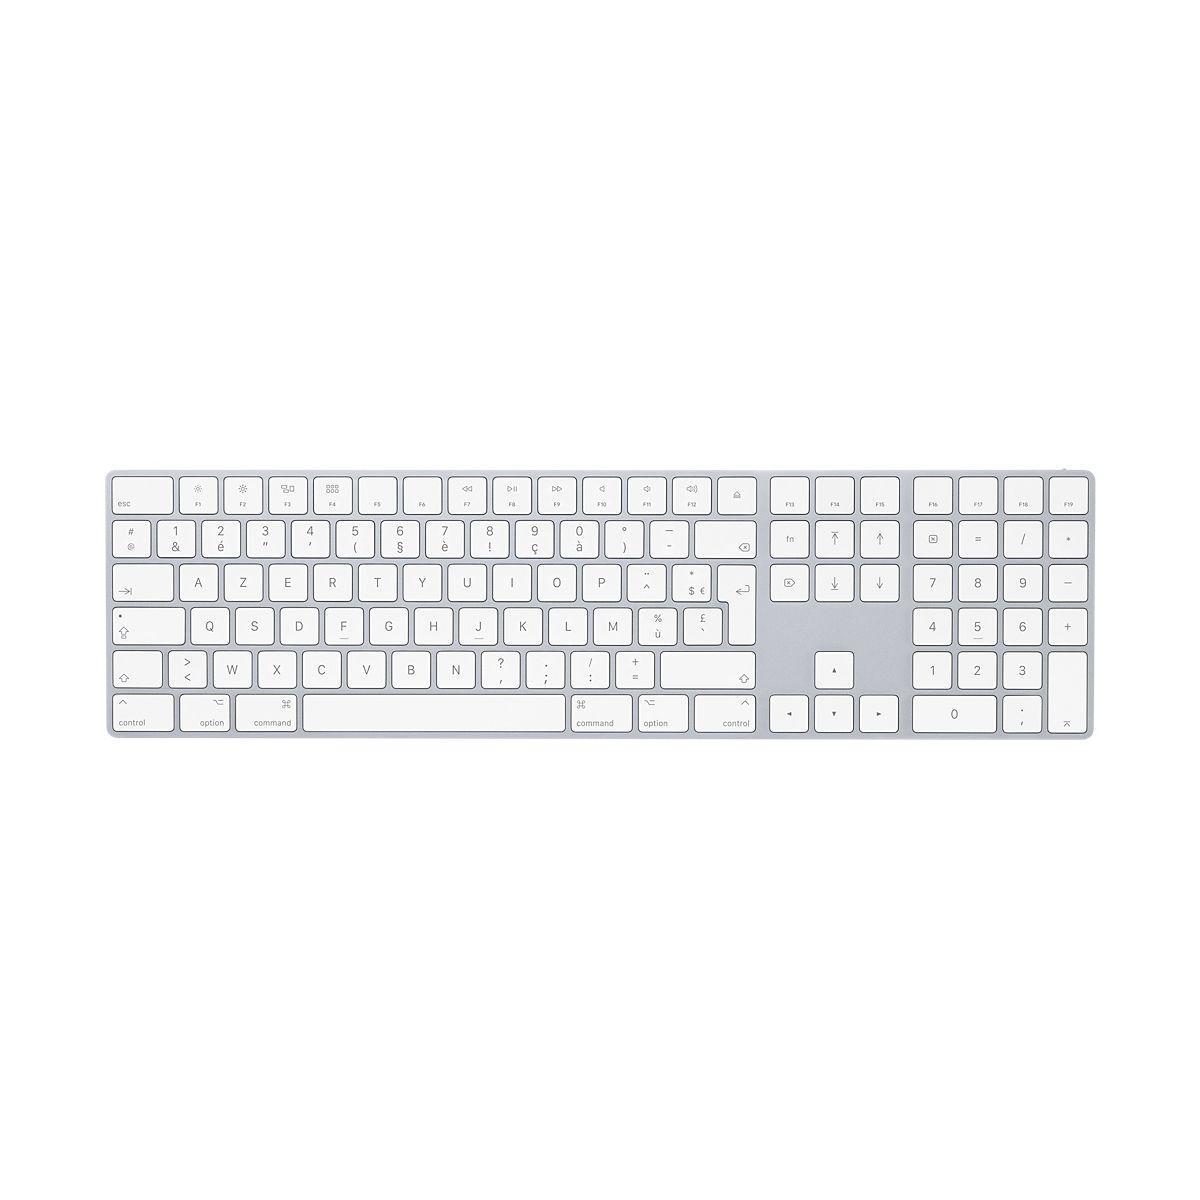 Clavier apple magic keyboard 2017 avec p - livraison offerte :...